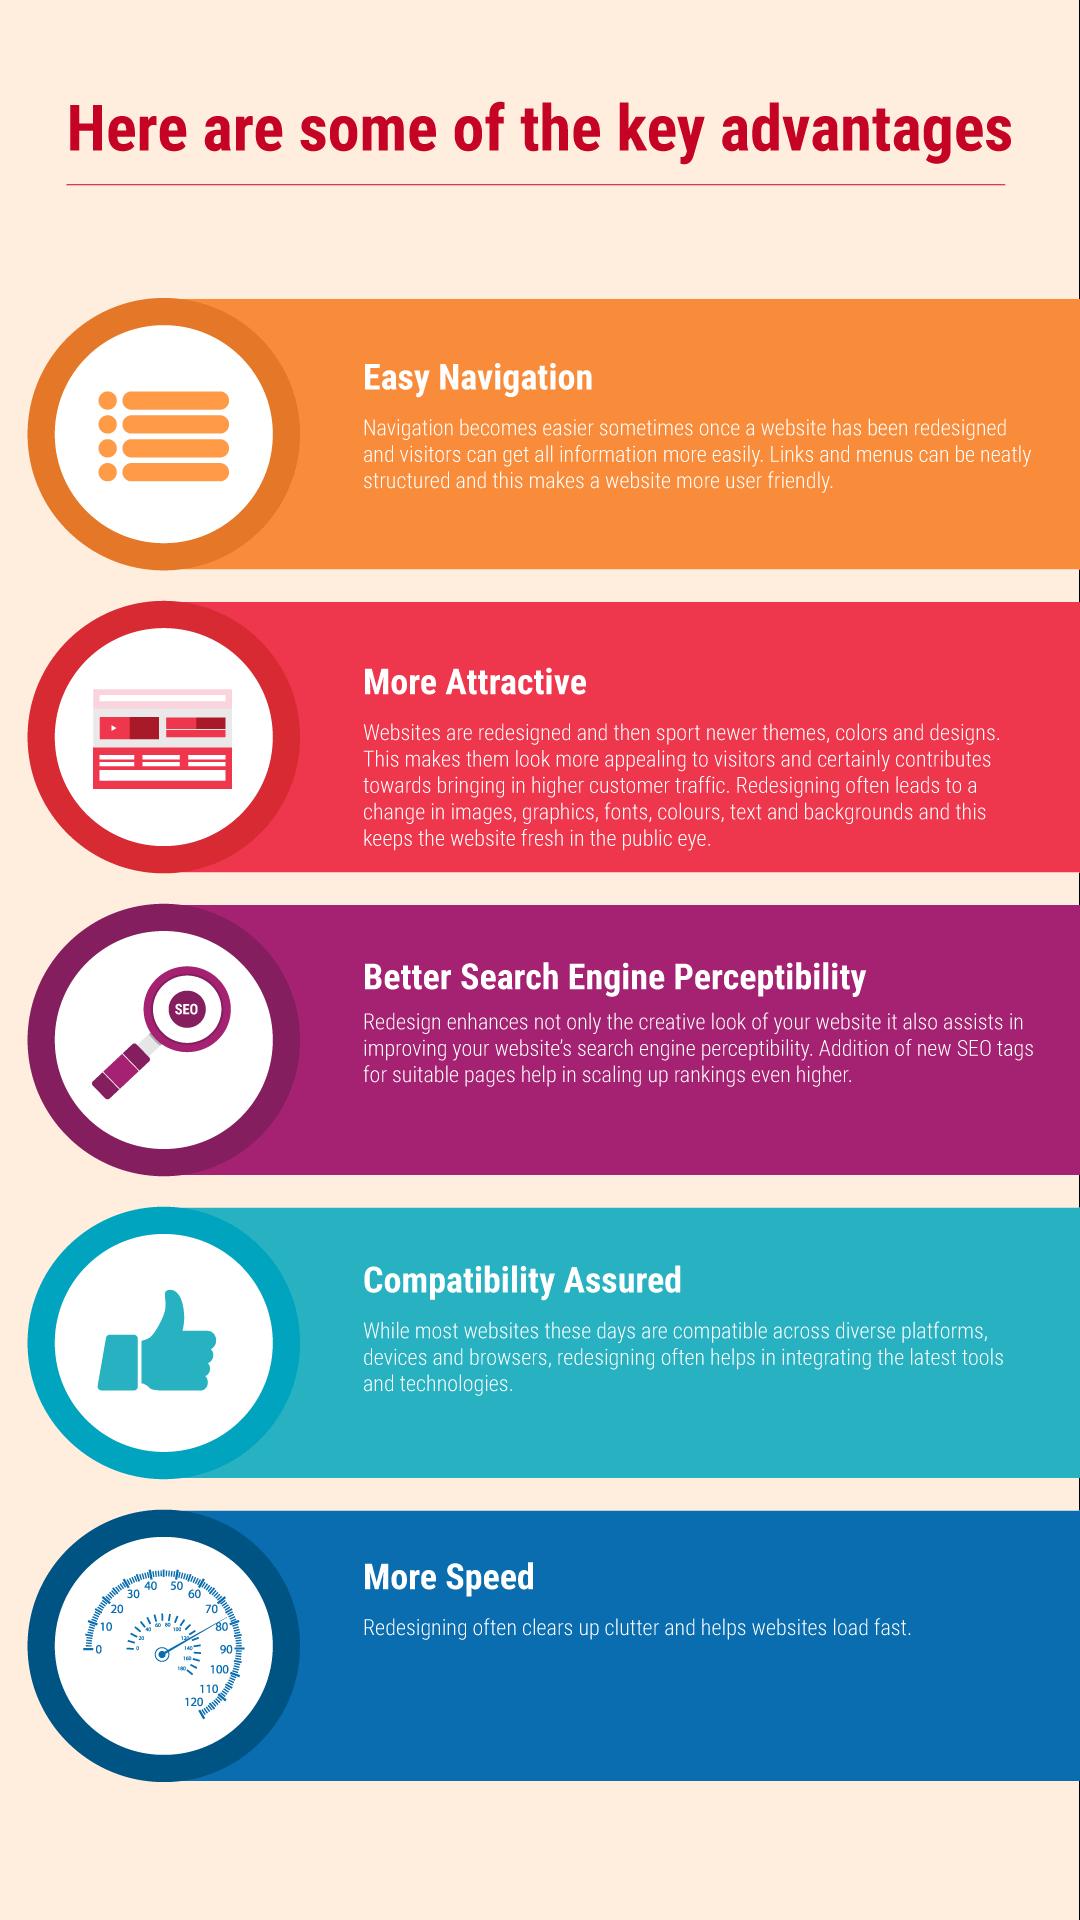 website redesign key advantages